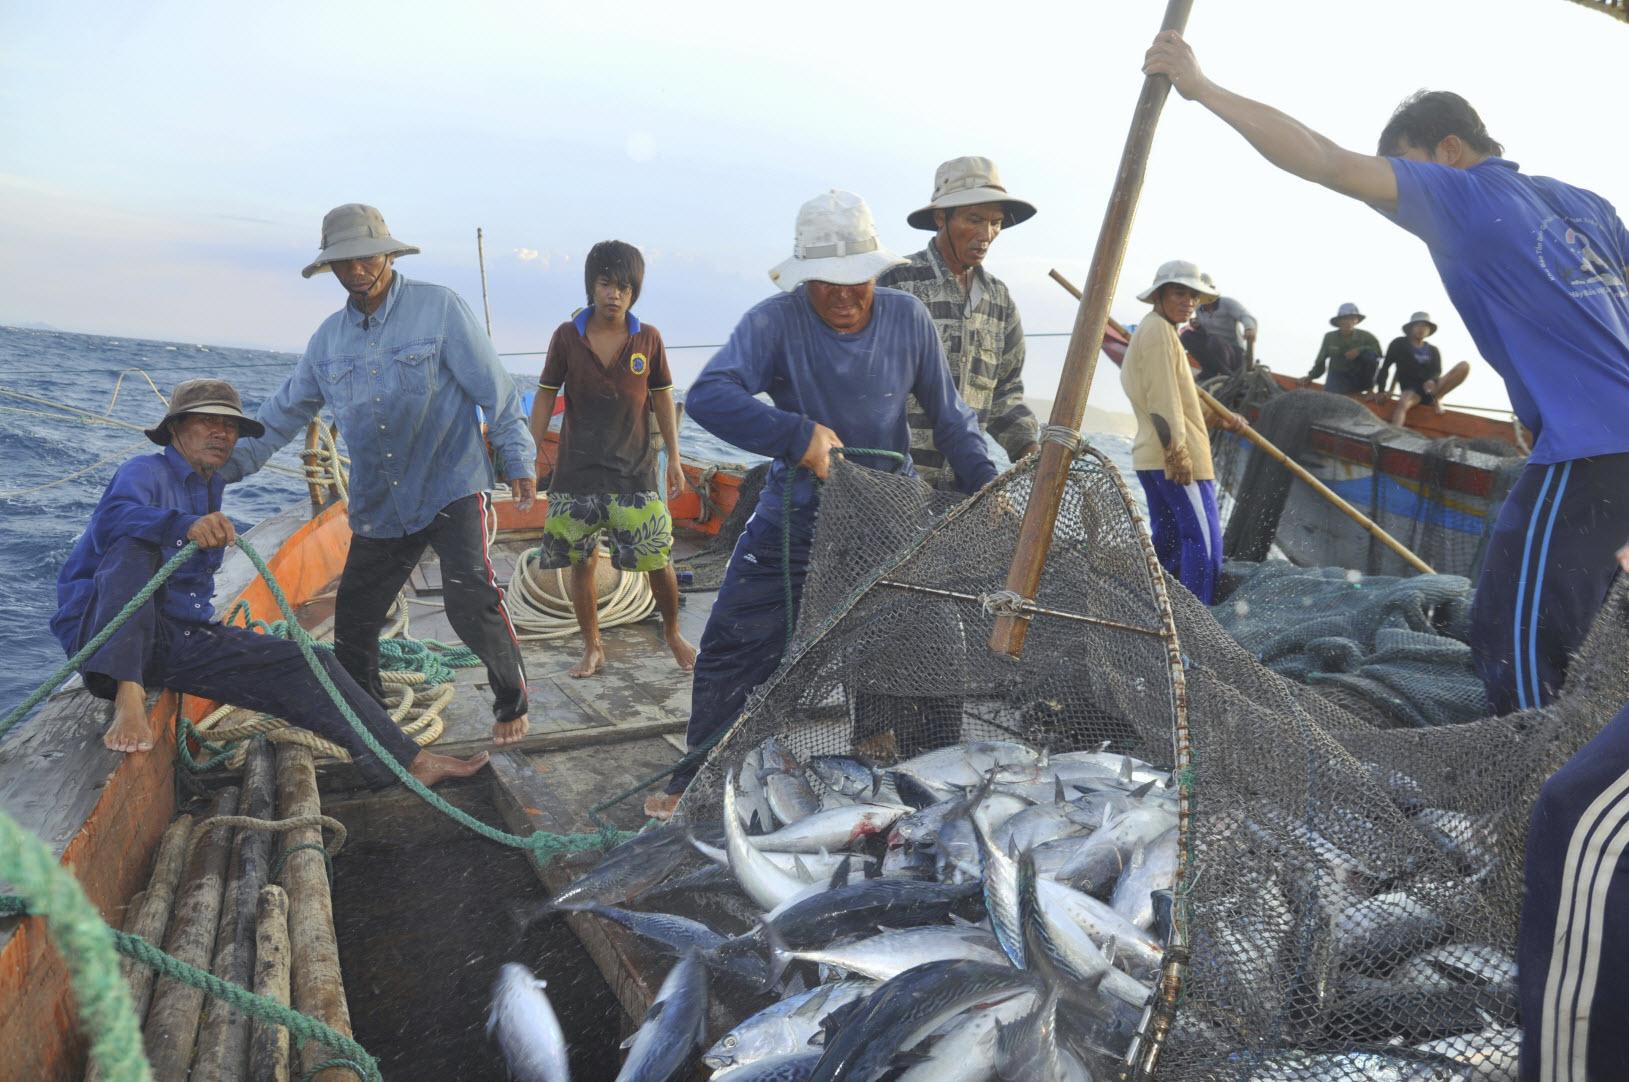 Modern Day Slavery in Fishing Industry